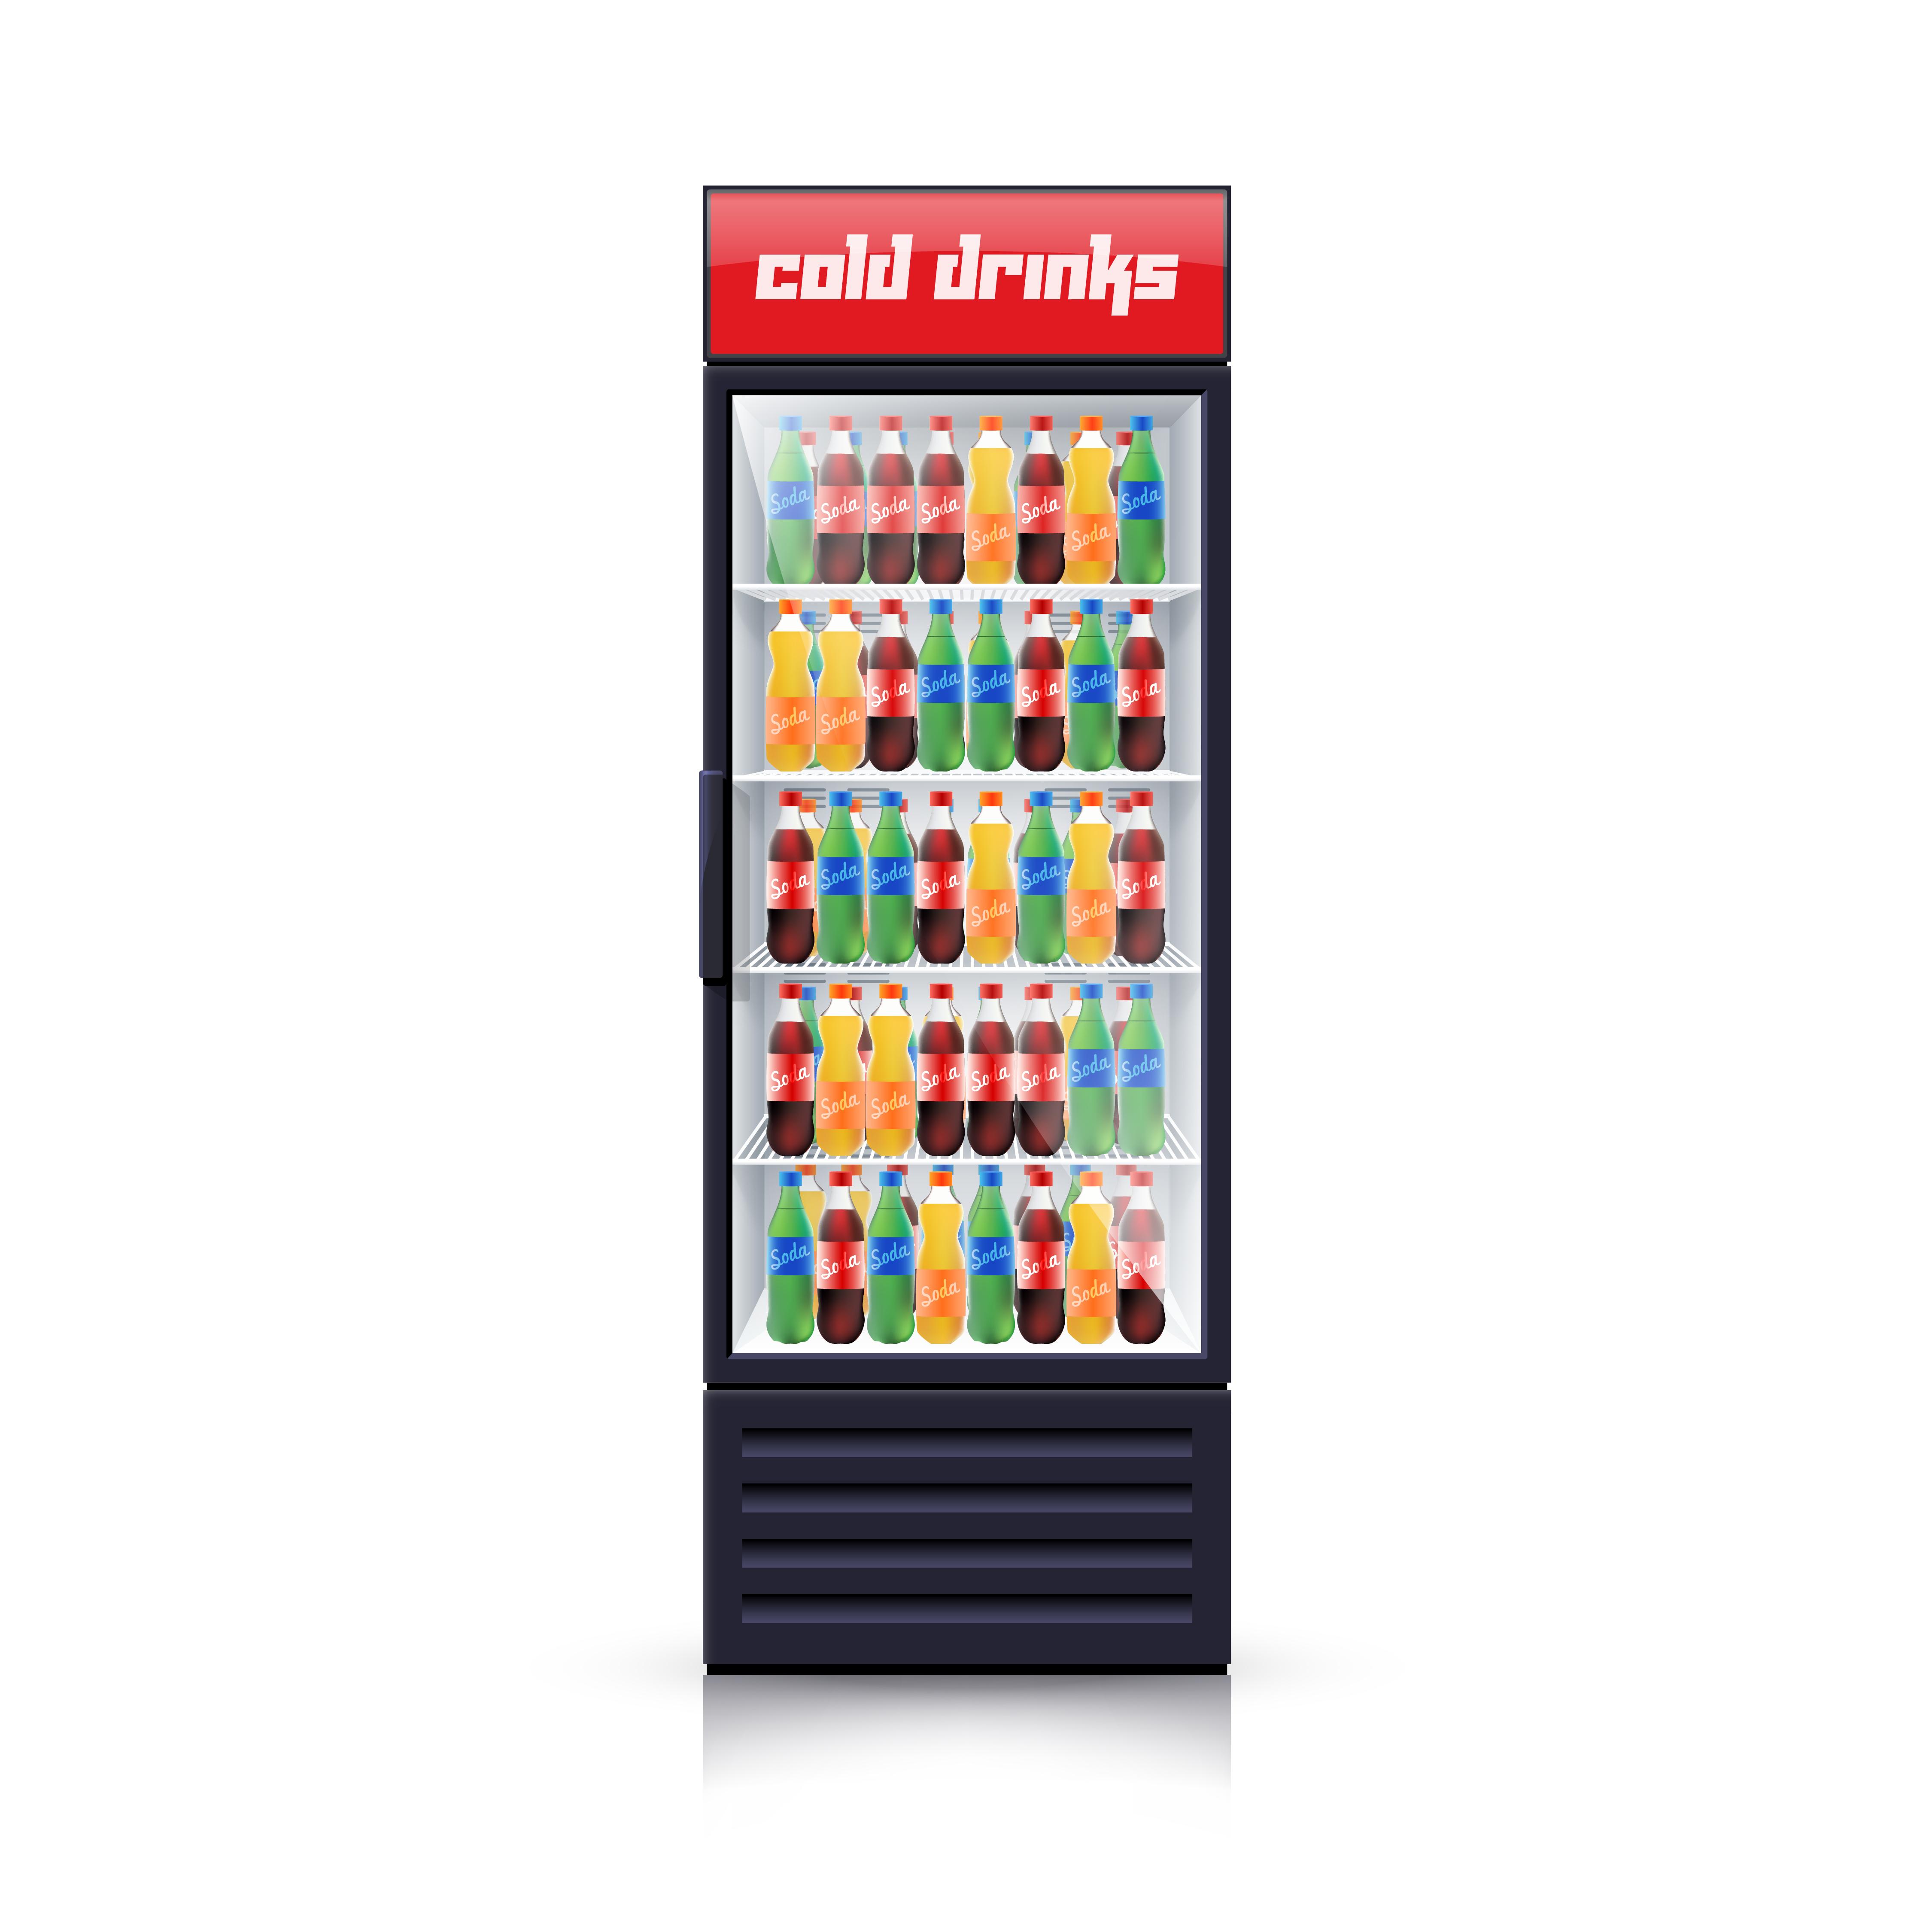 Cola Fridge Dispenser Realistic Illustration Icon Download Free Vectors Clipart Graphics